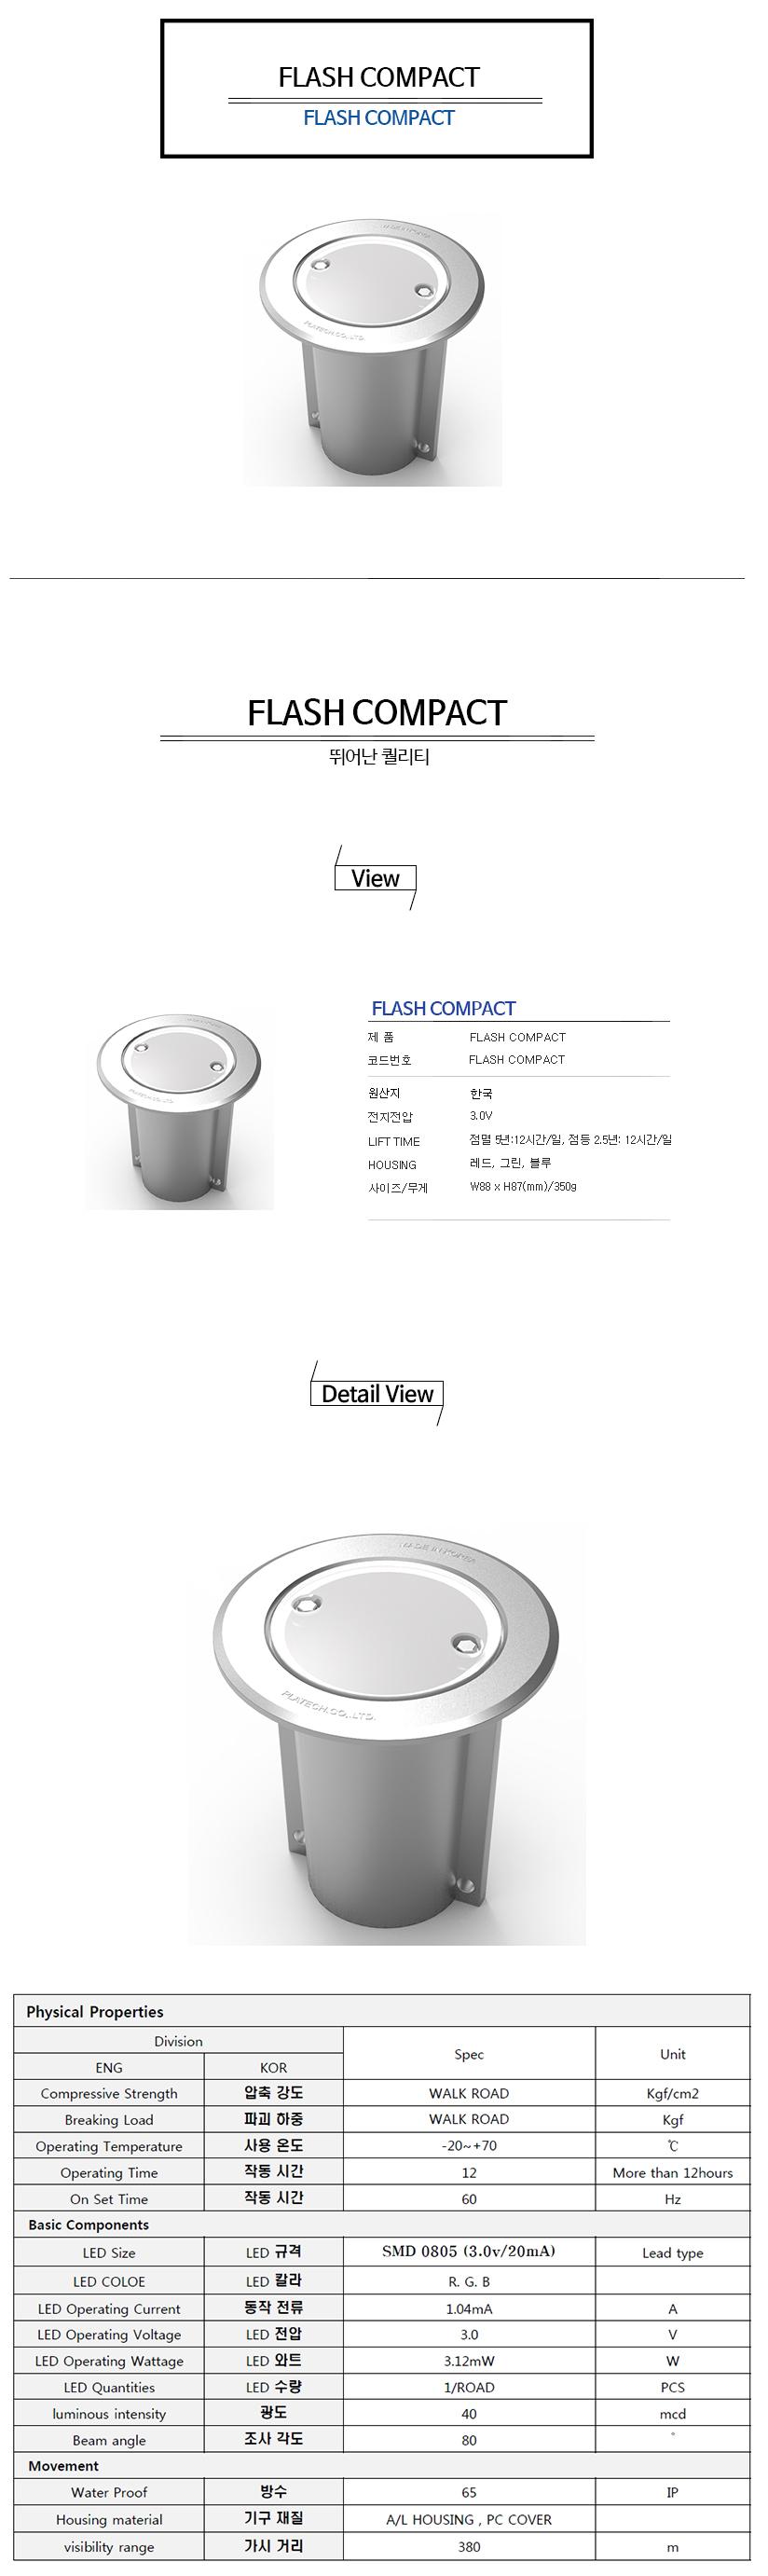 FLASH COMPACT.jpg